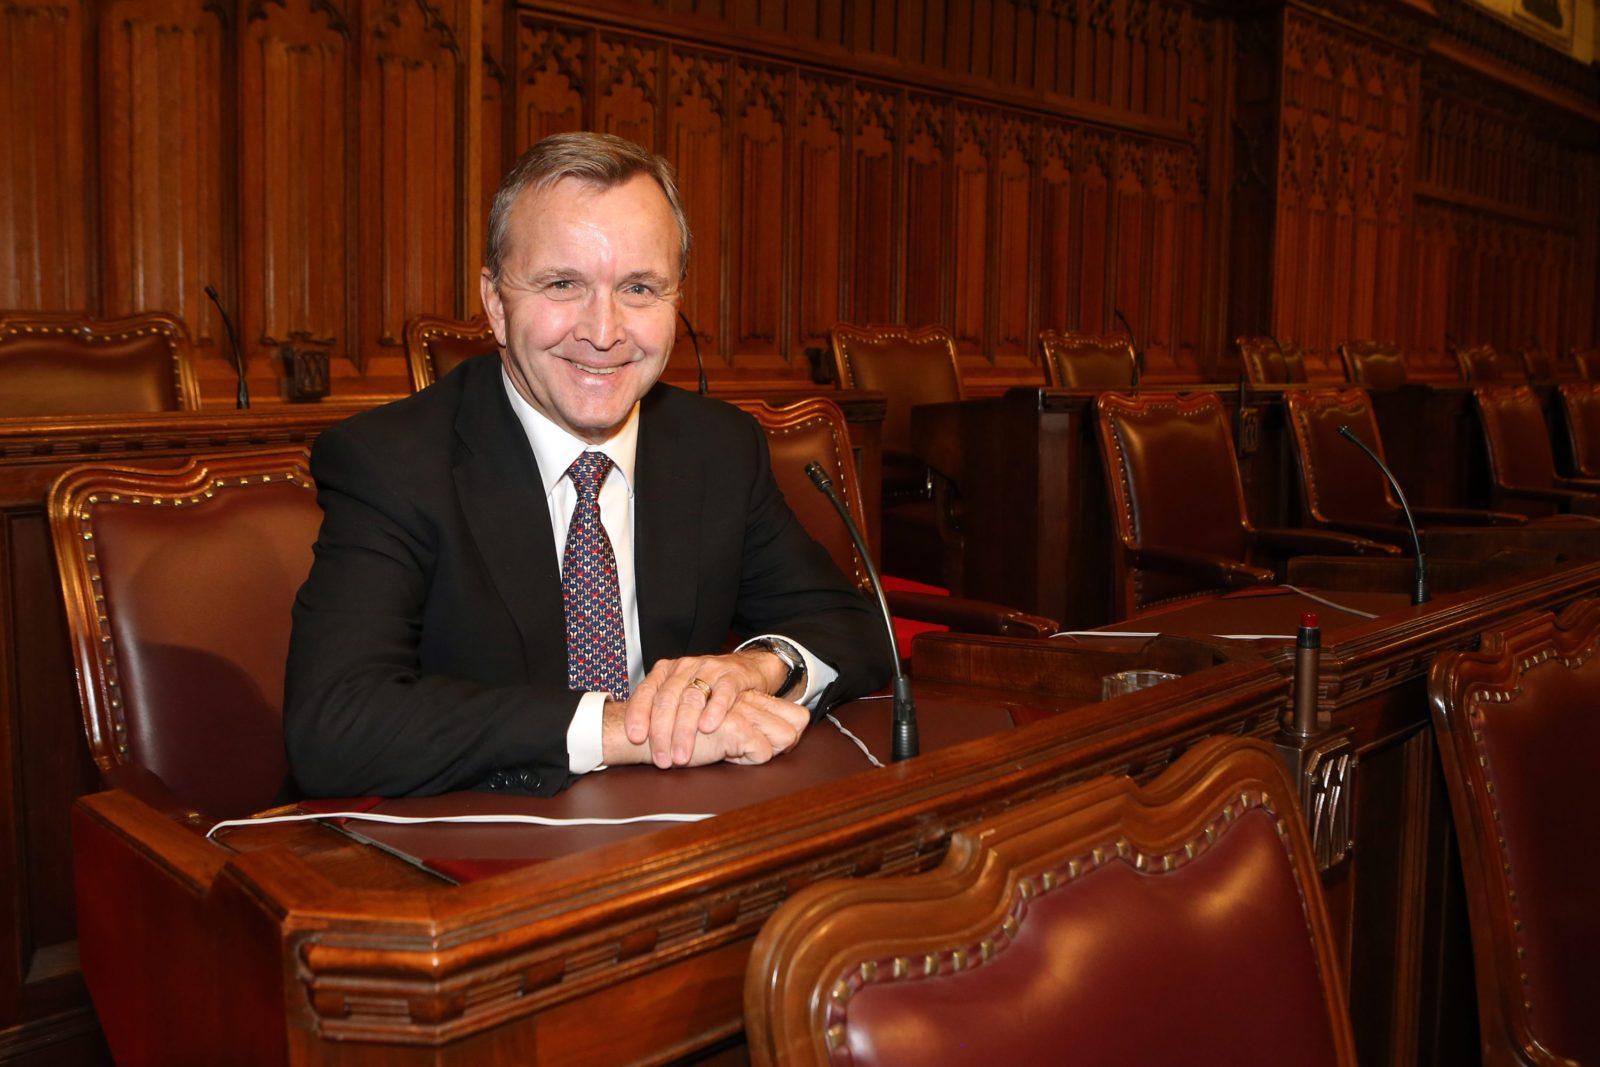 Reducing partisanship in the Senate increases credibility: Senator Mitchell